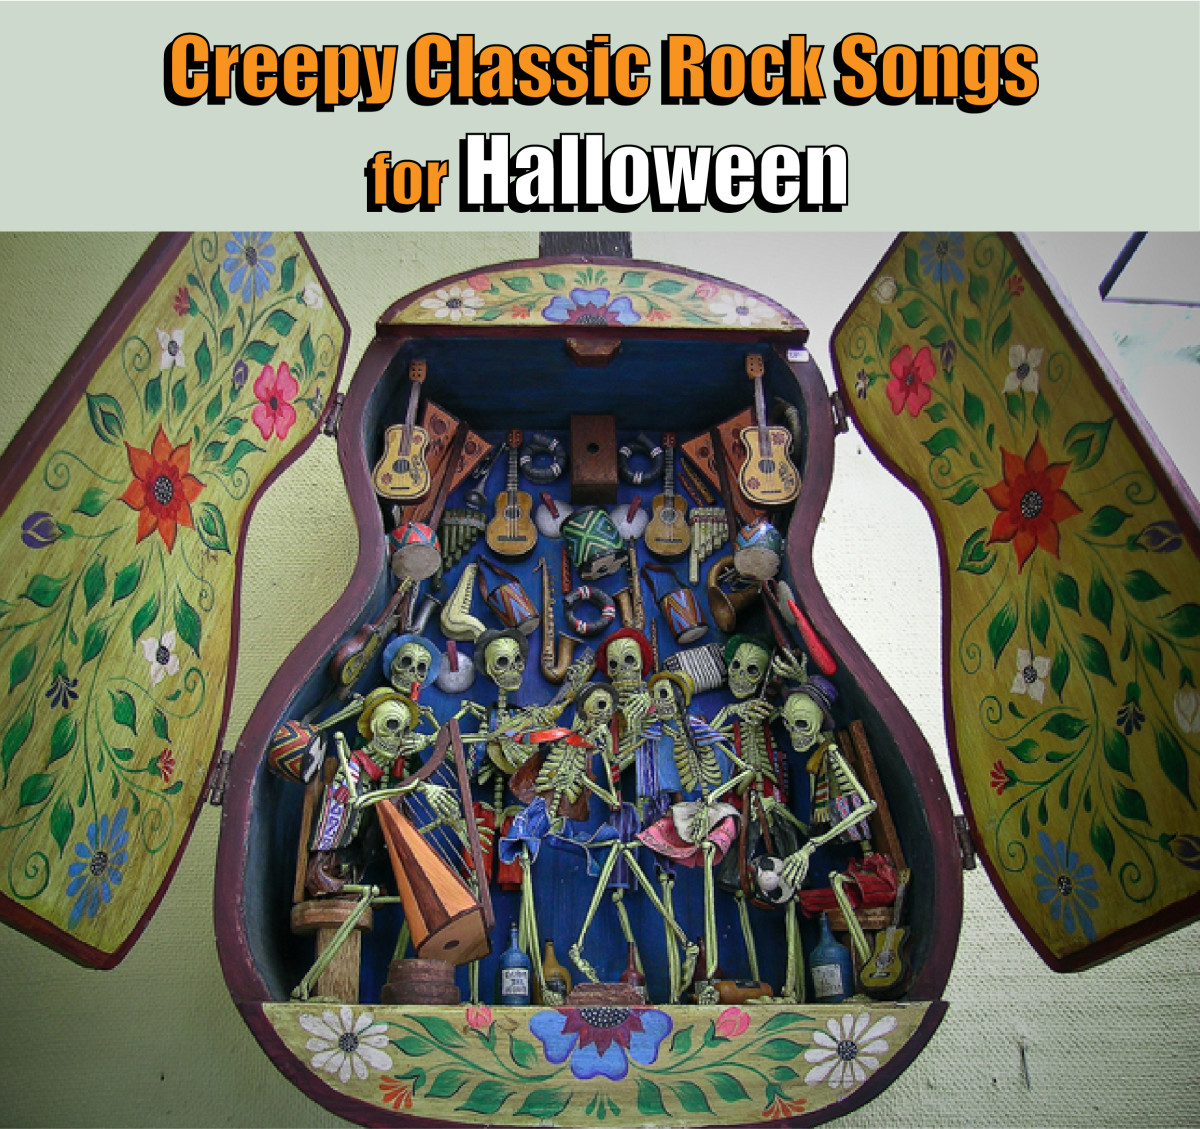 Nine Creepy Classic Rock Songs for Halloween